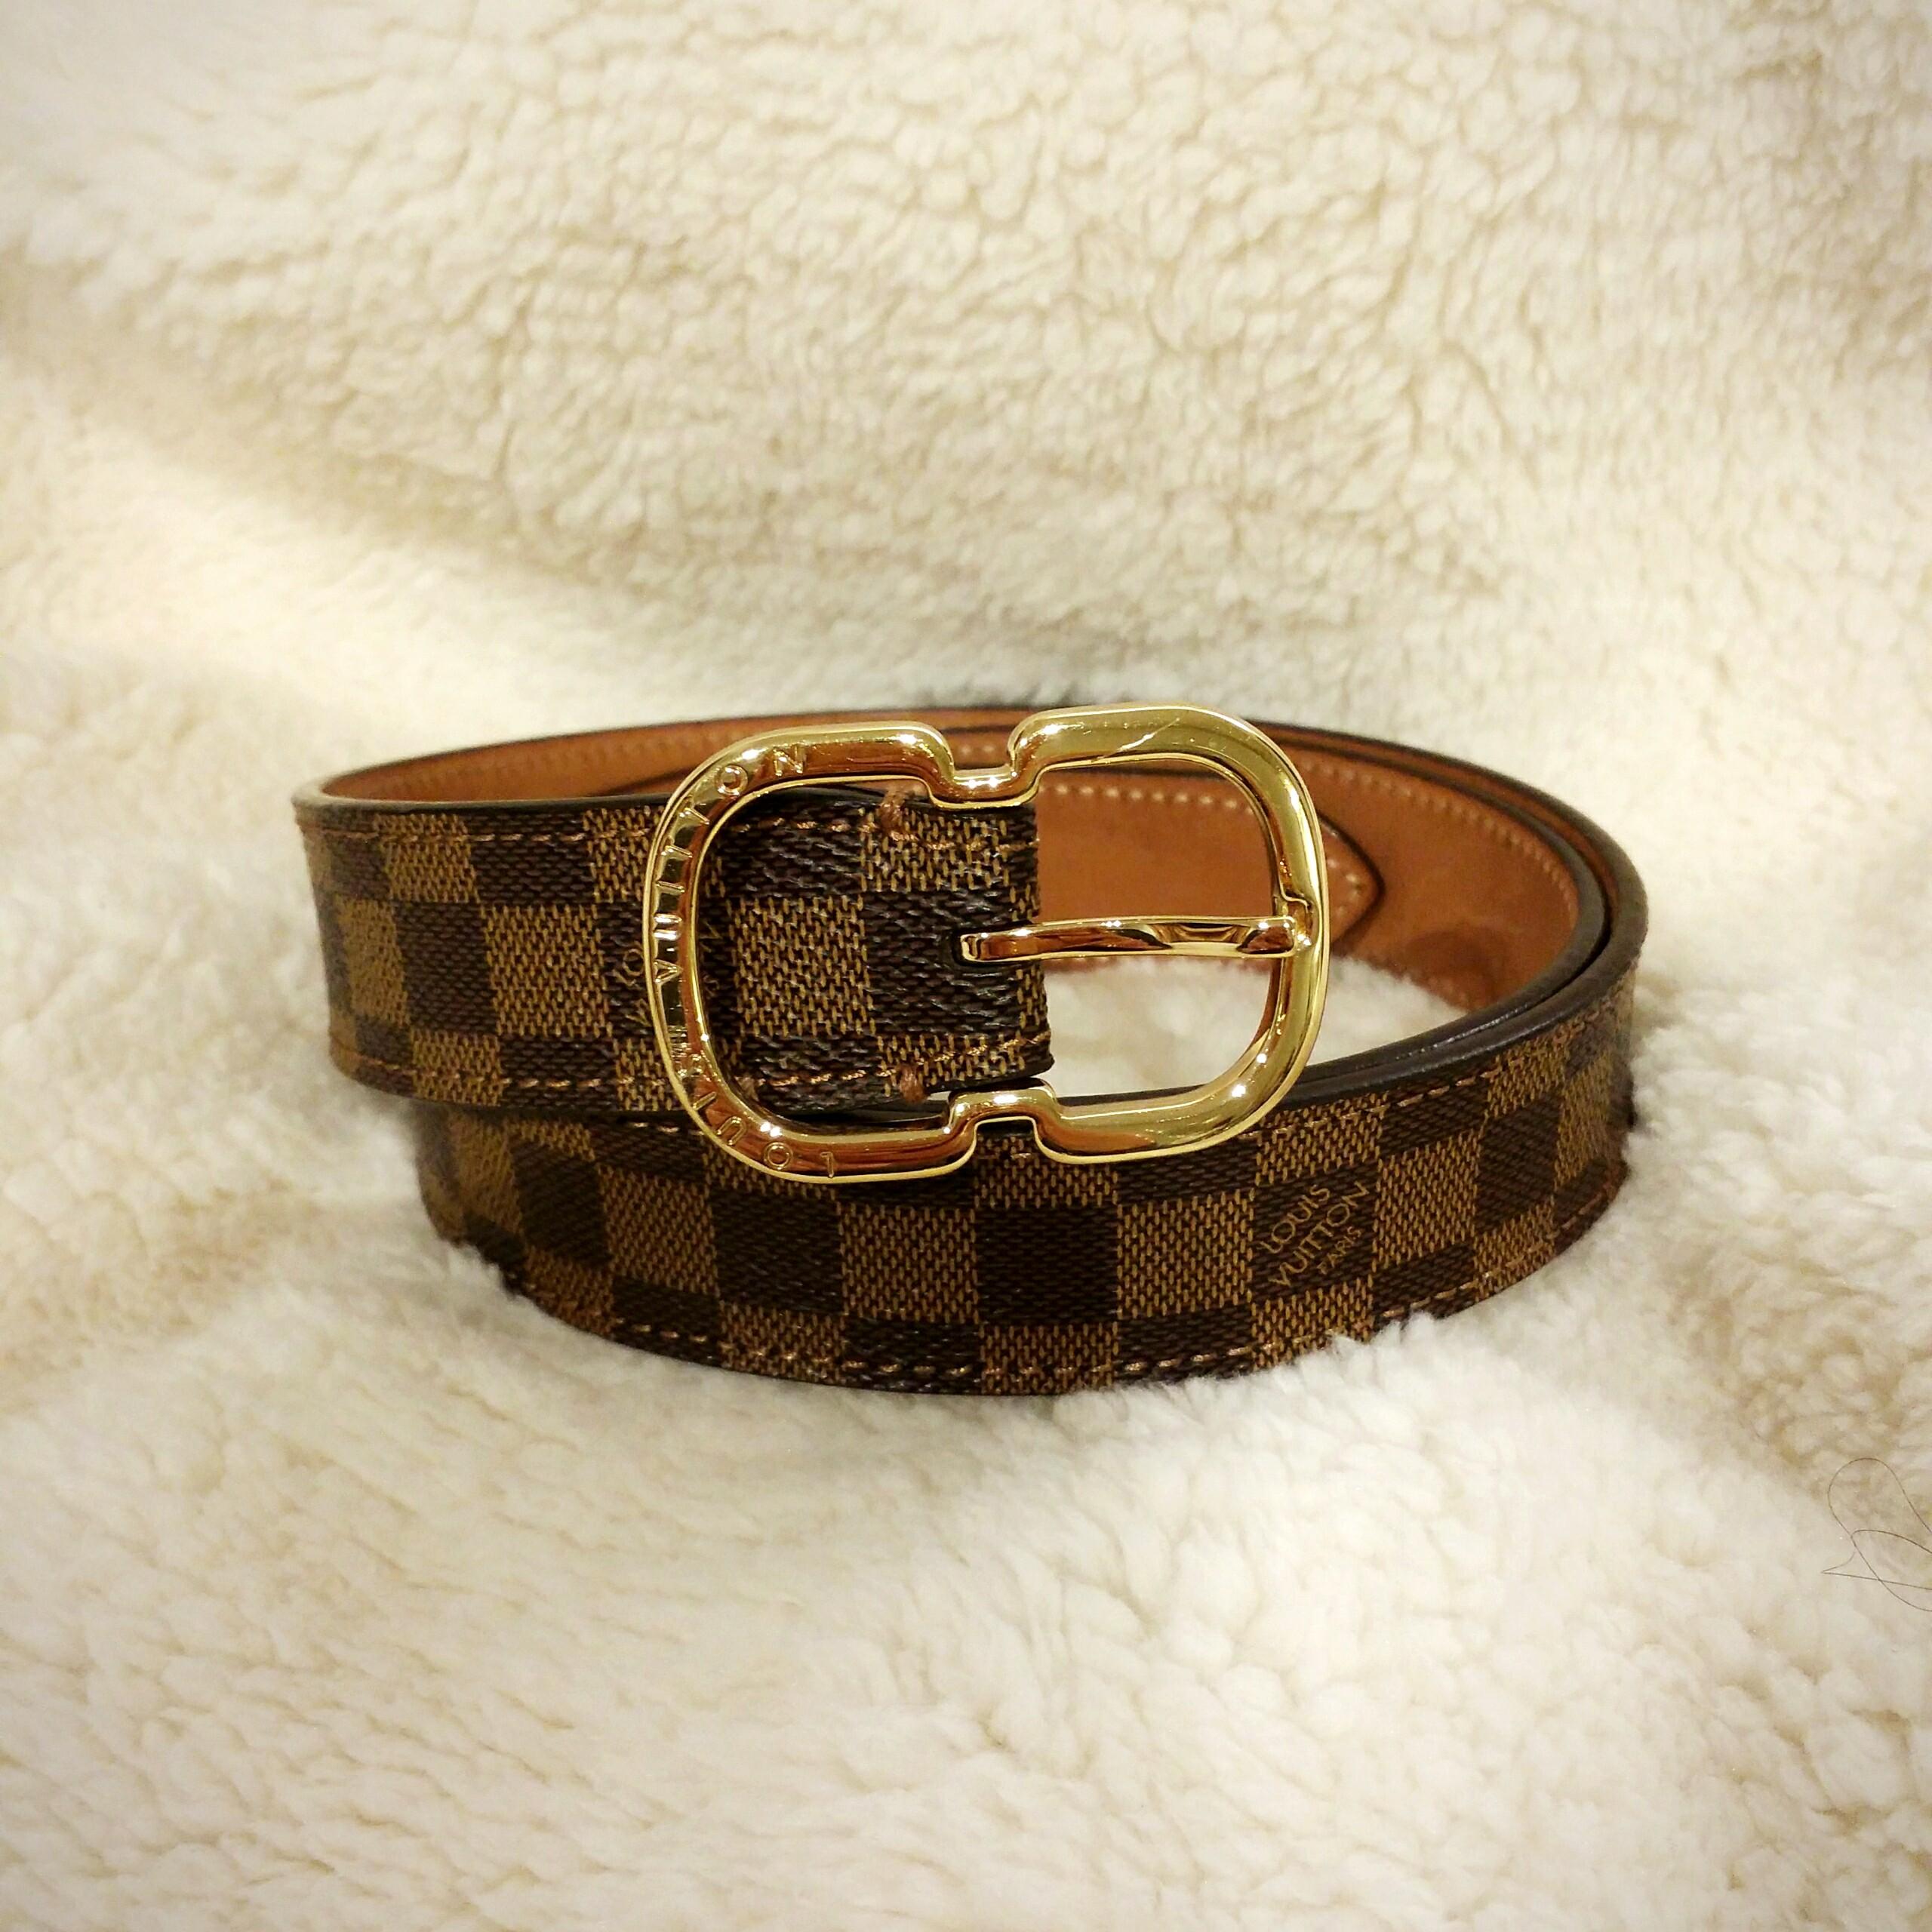 6676f2ca59ca Authentic Louis Vuitton Mini 25mm Belt